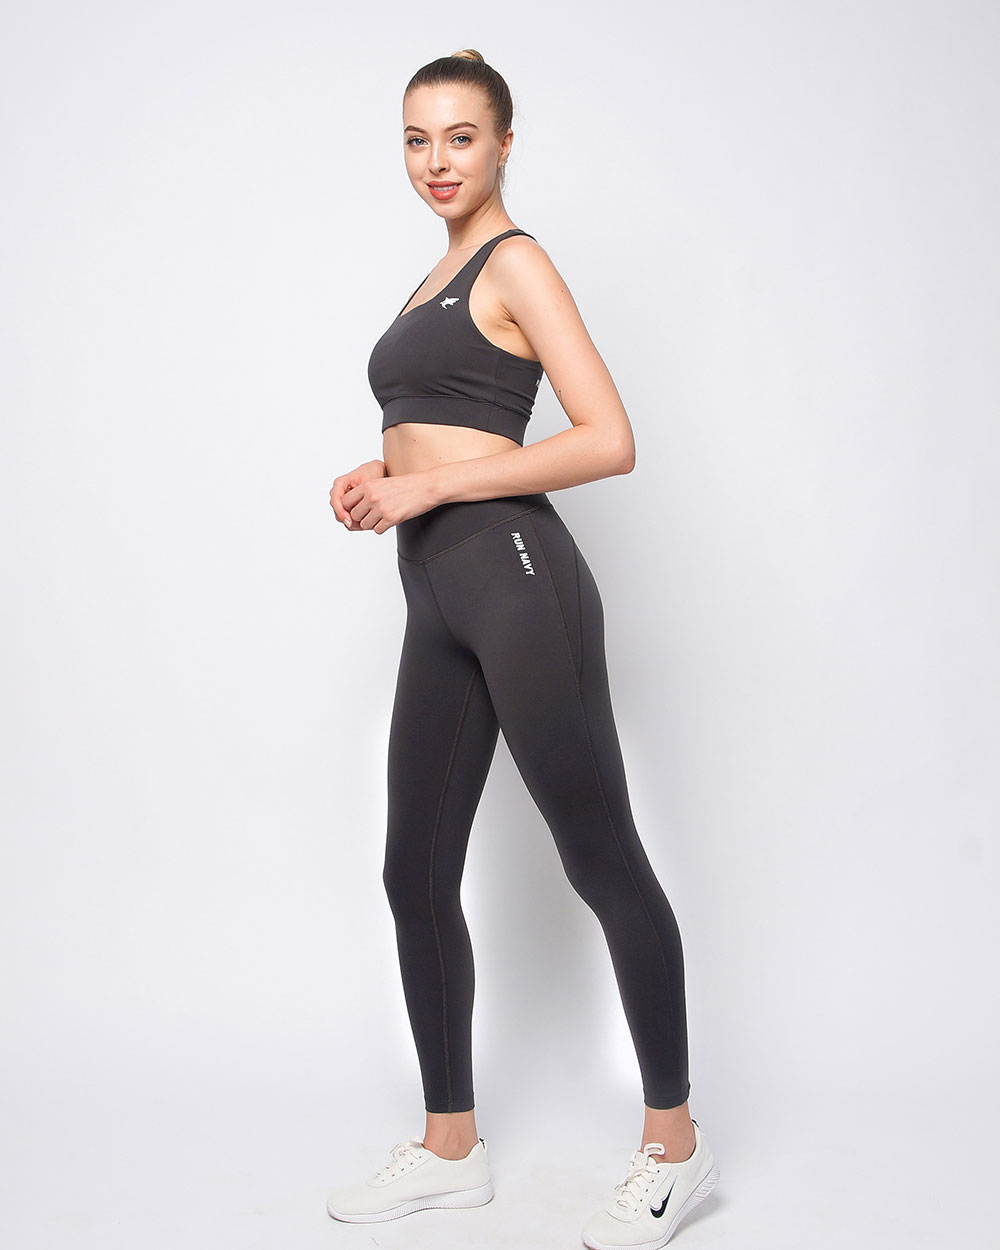 Quần legging nữ WLF65